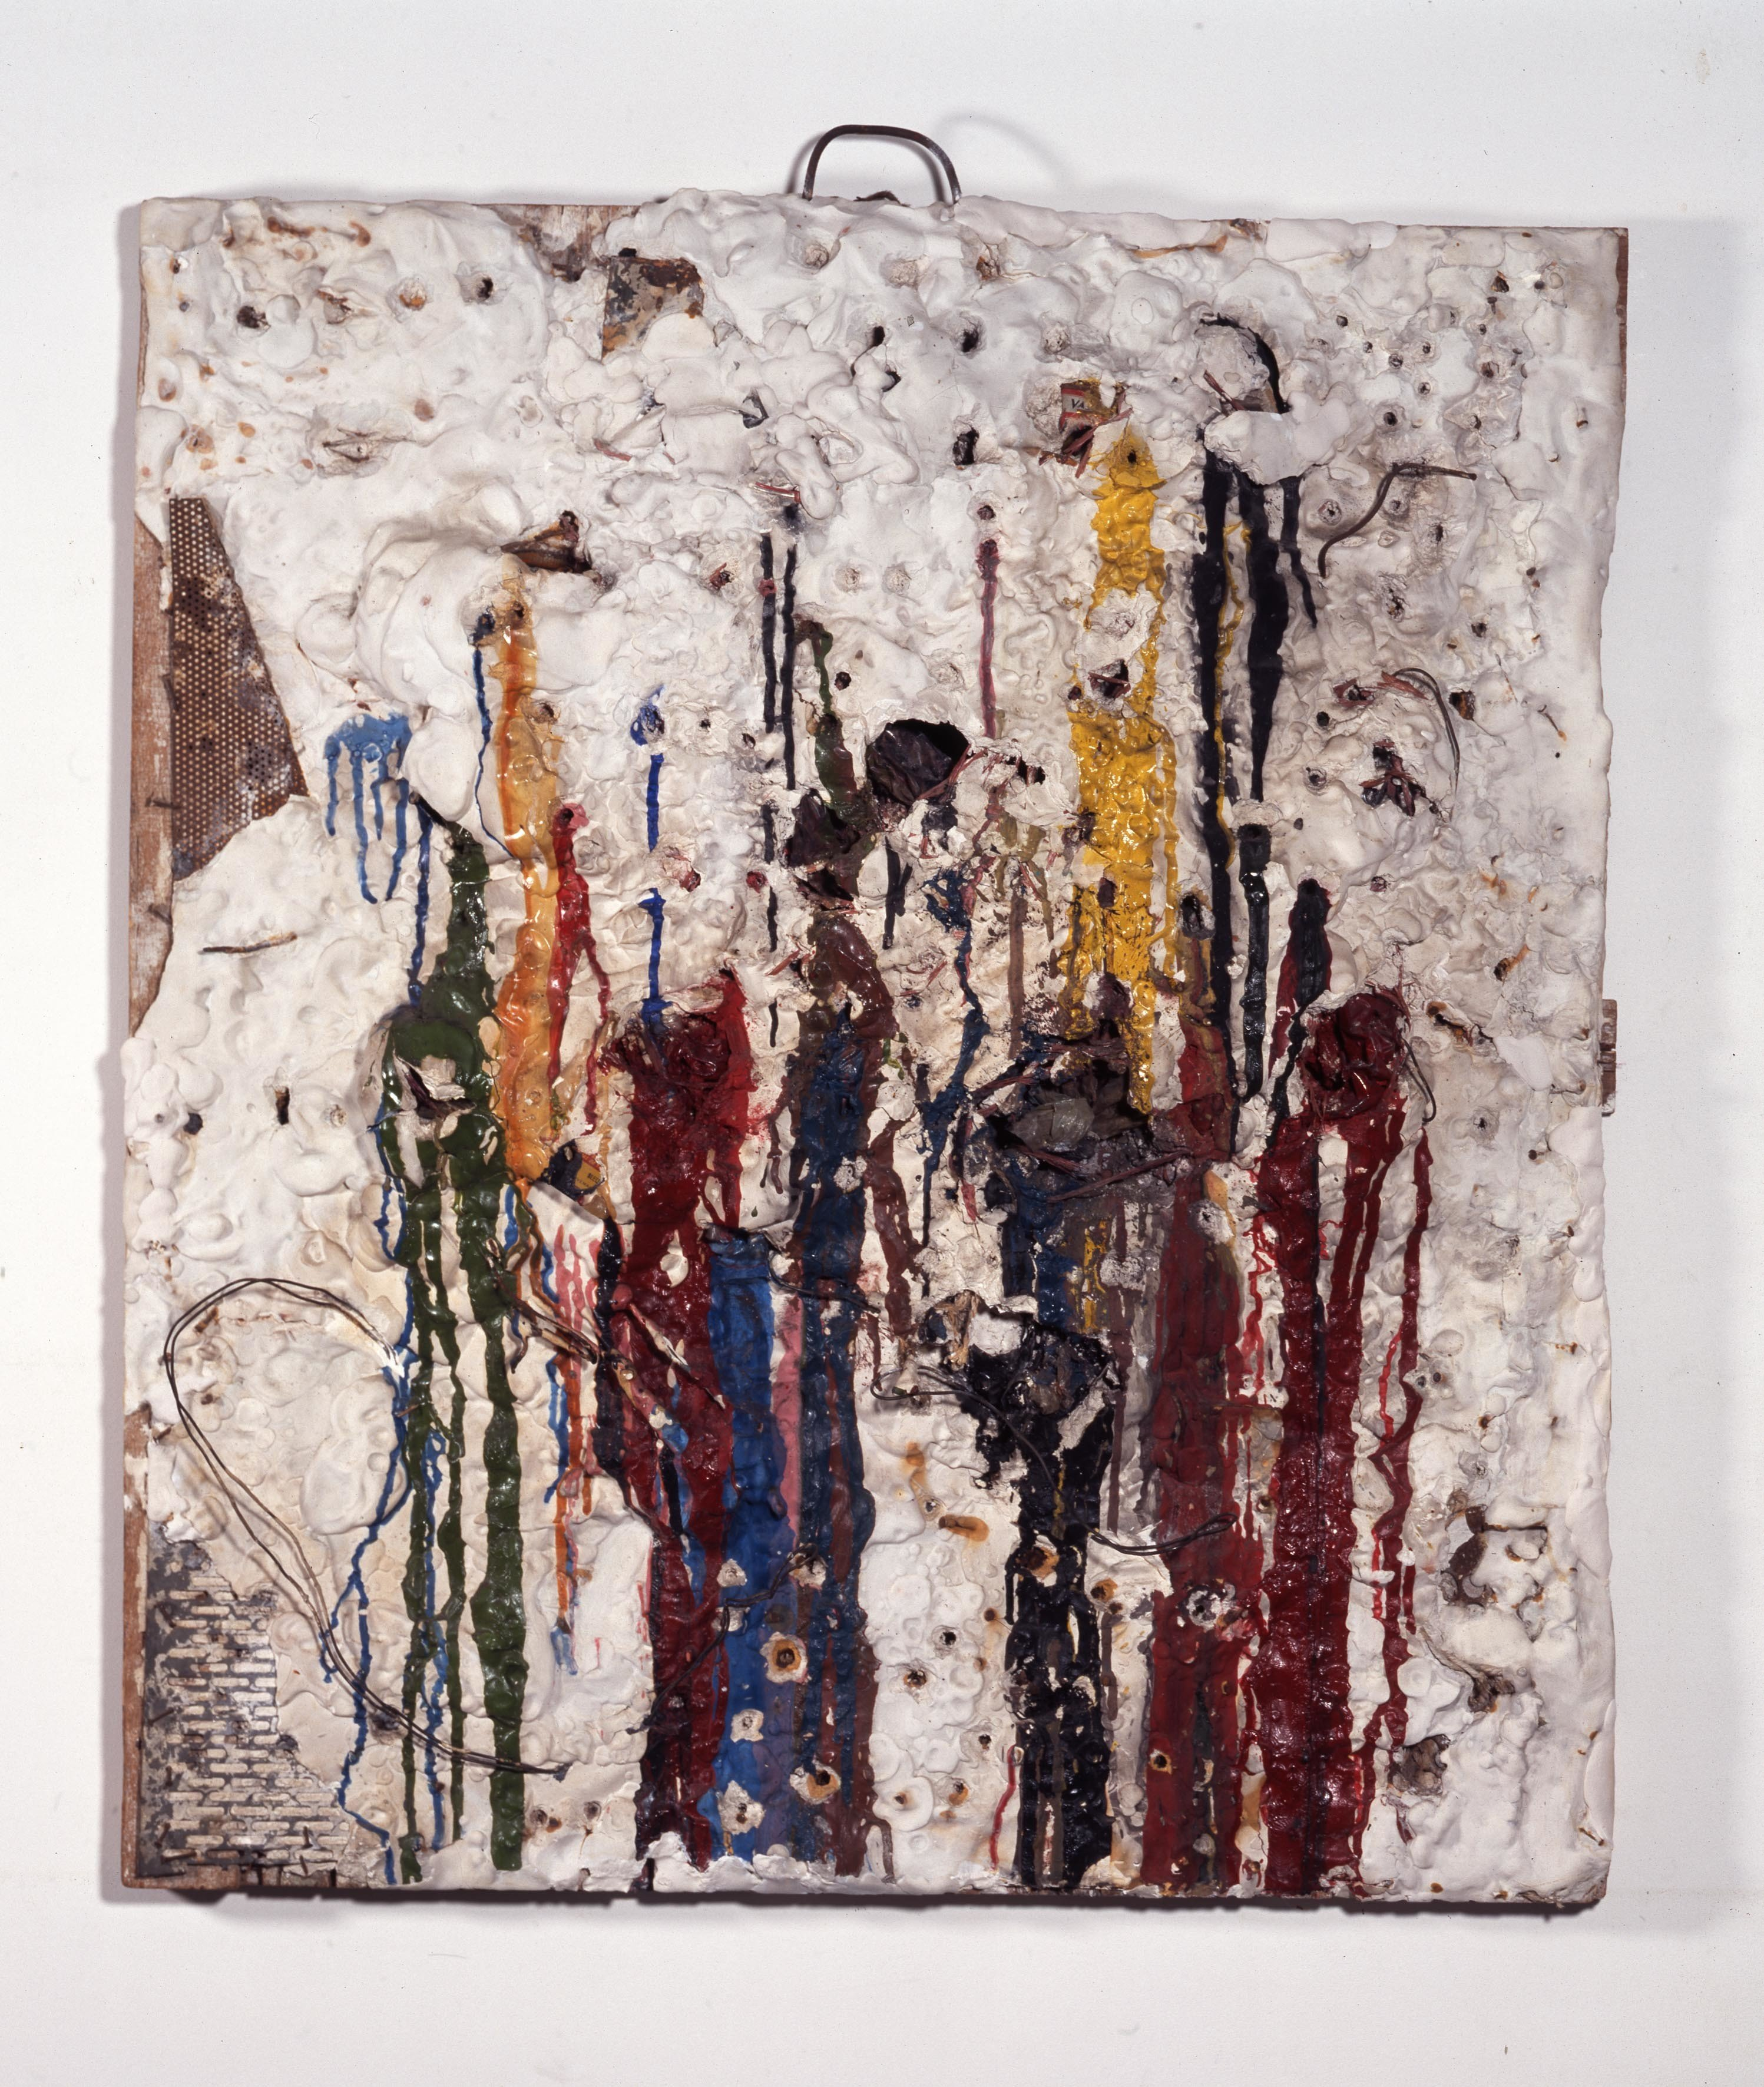 Niki de Saint Phalle · Tir – séance Galerie J